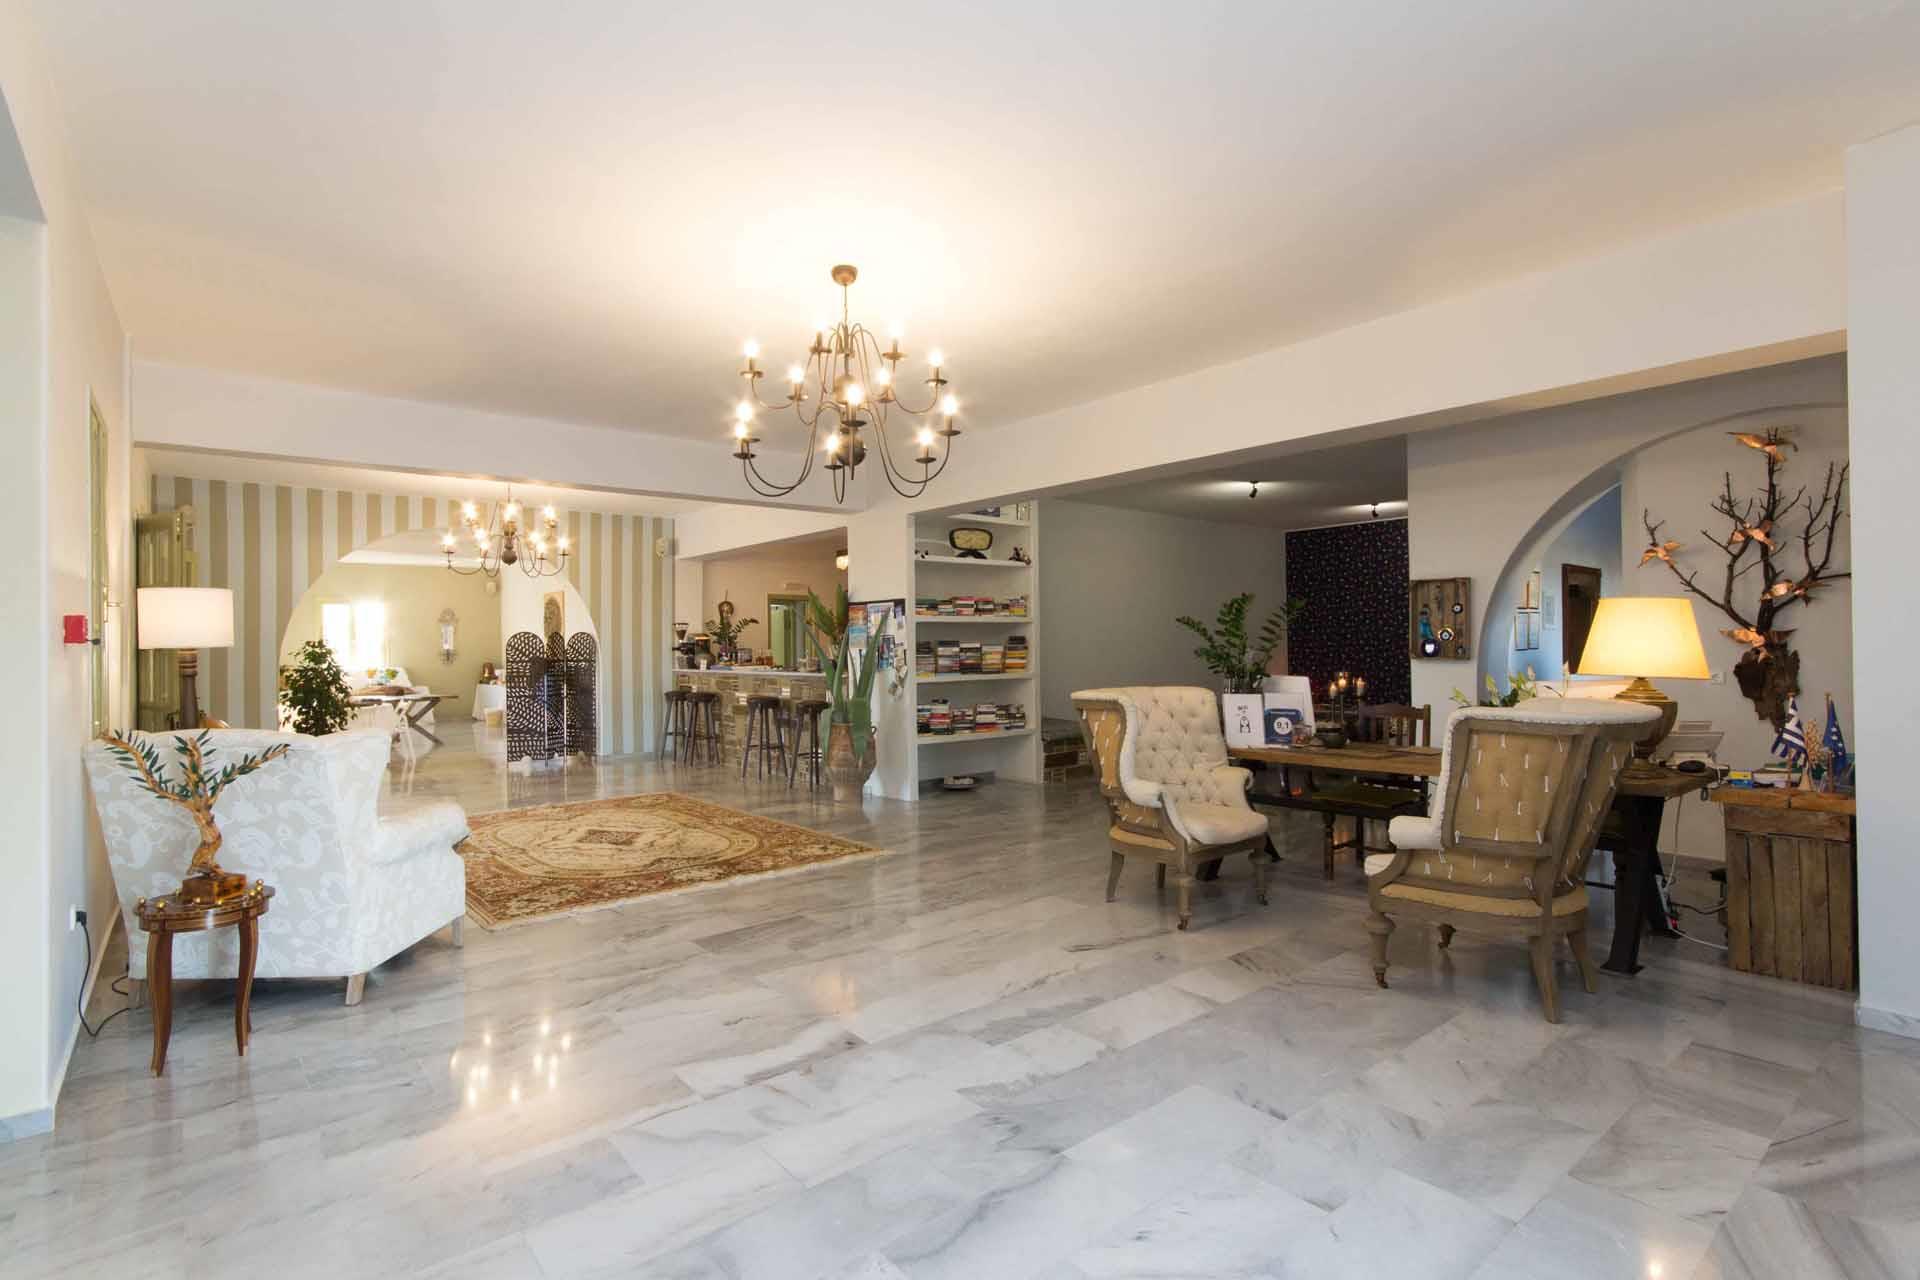 Parosland Hotel & Resort